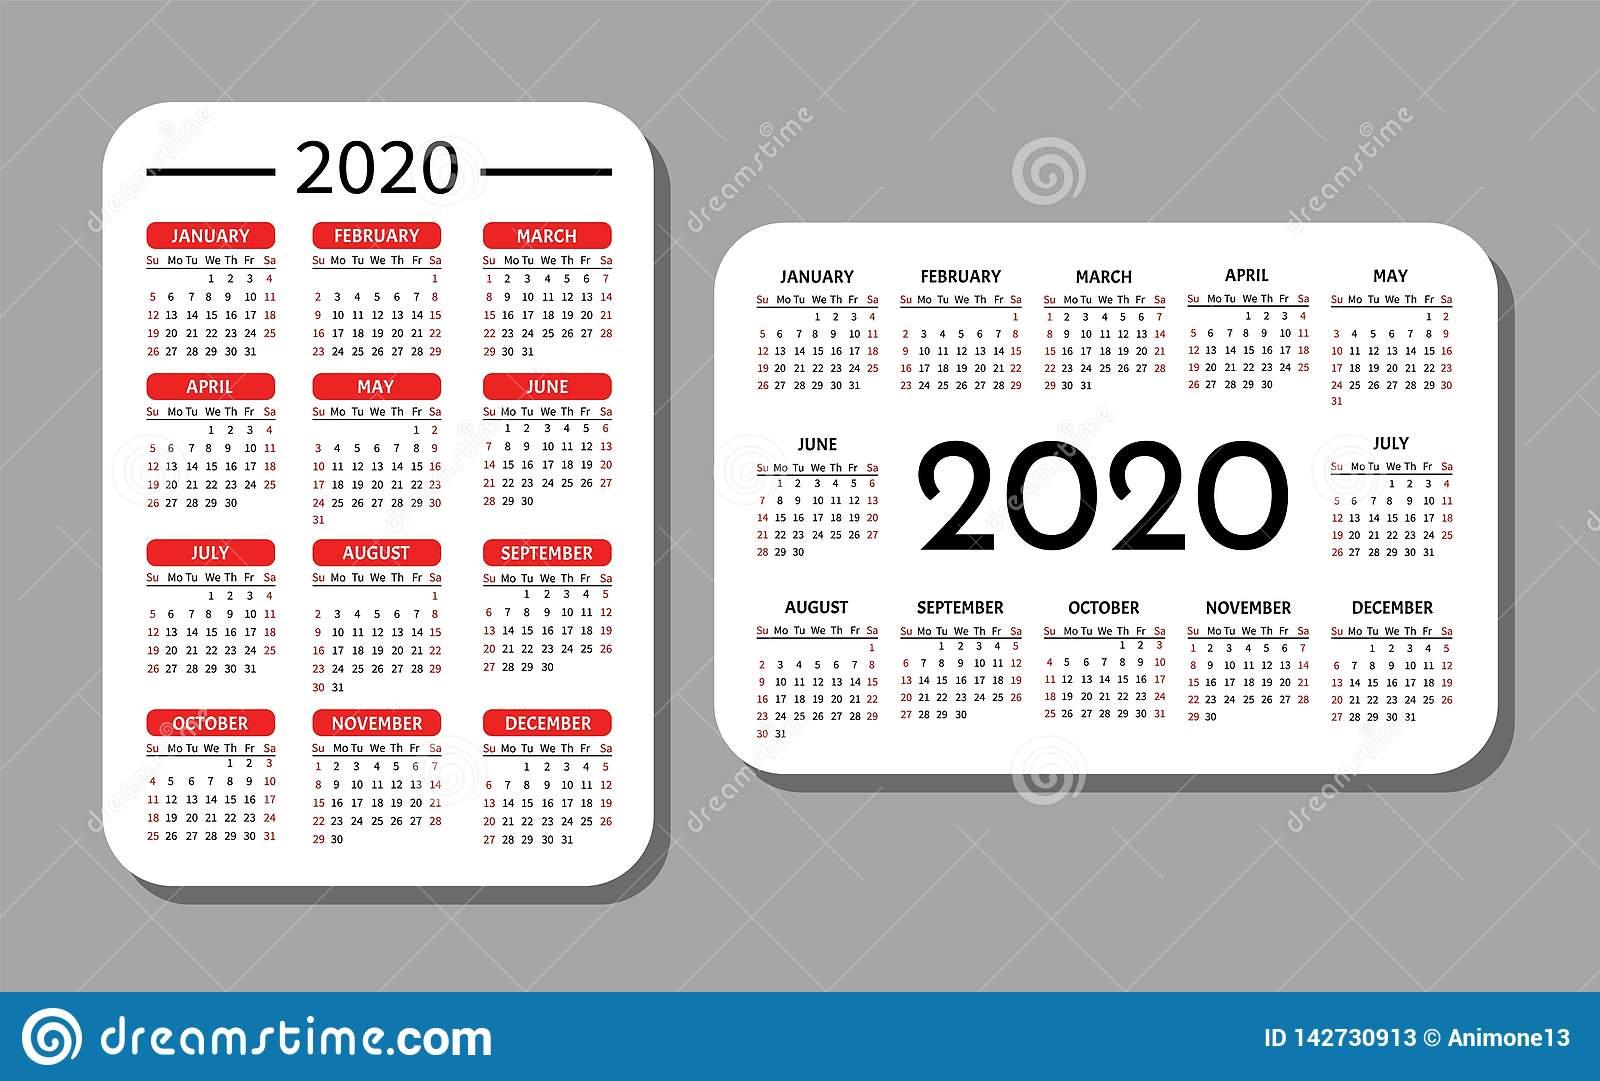 Pocket Calendar Template. Stock Vector. Illustration Of